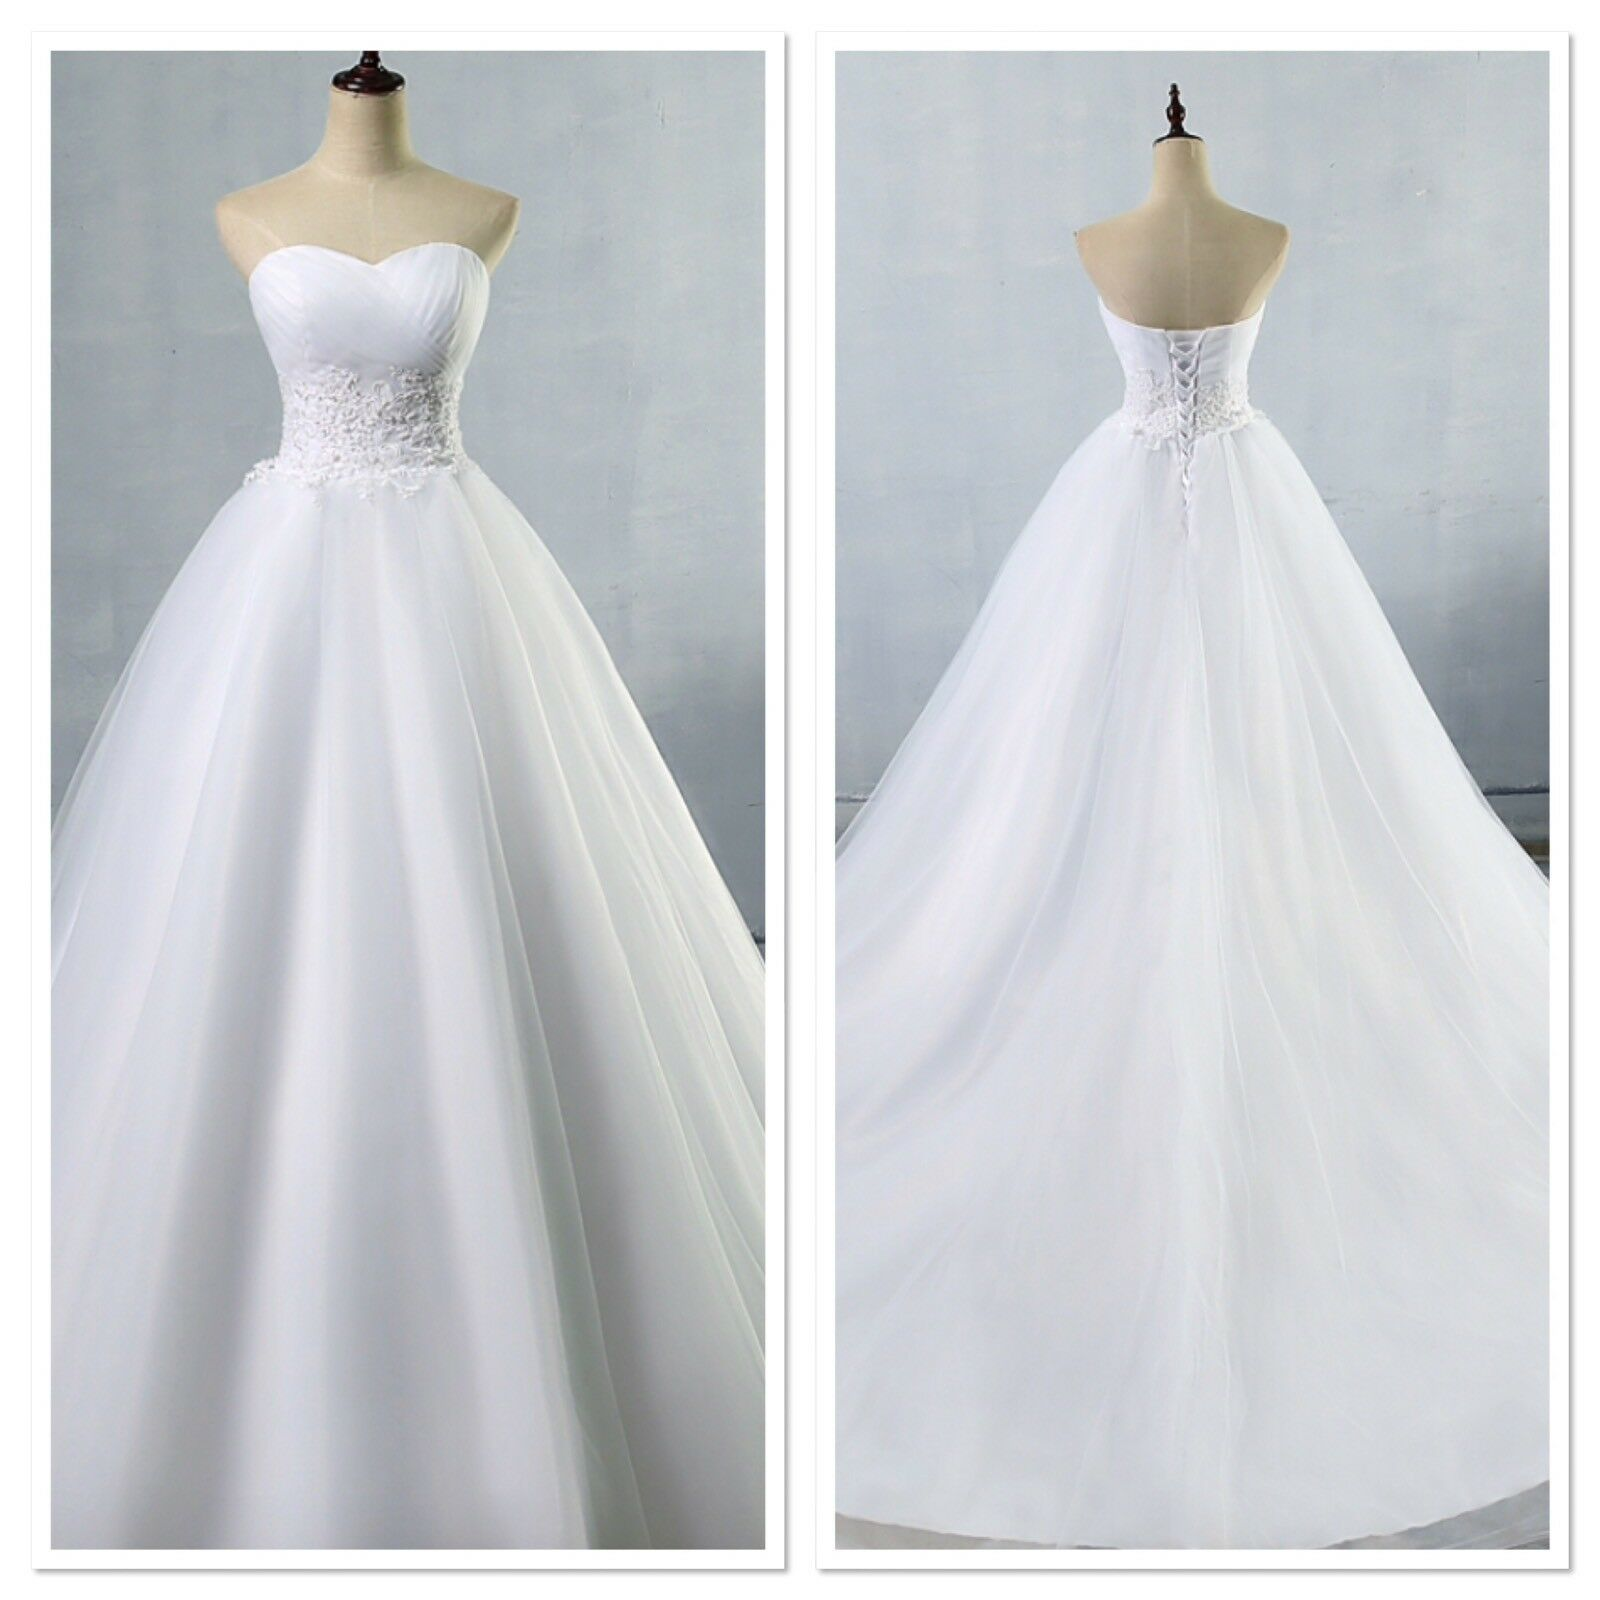 UK Plus Size White/Ivory Strapless Sweetheart A Line Wedding Dresses Size 6-26